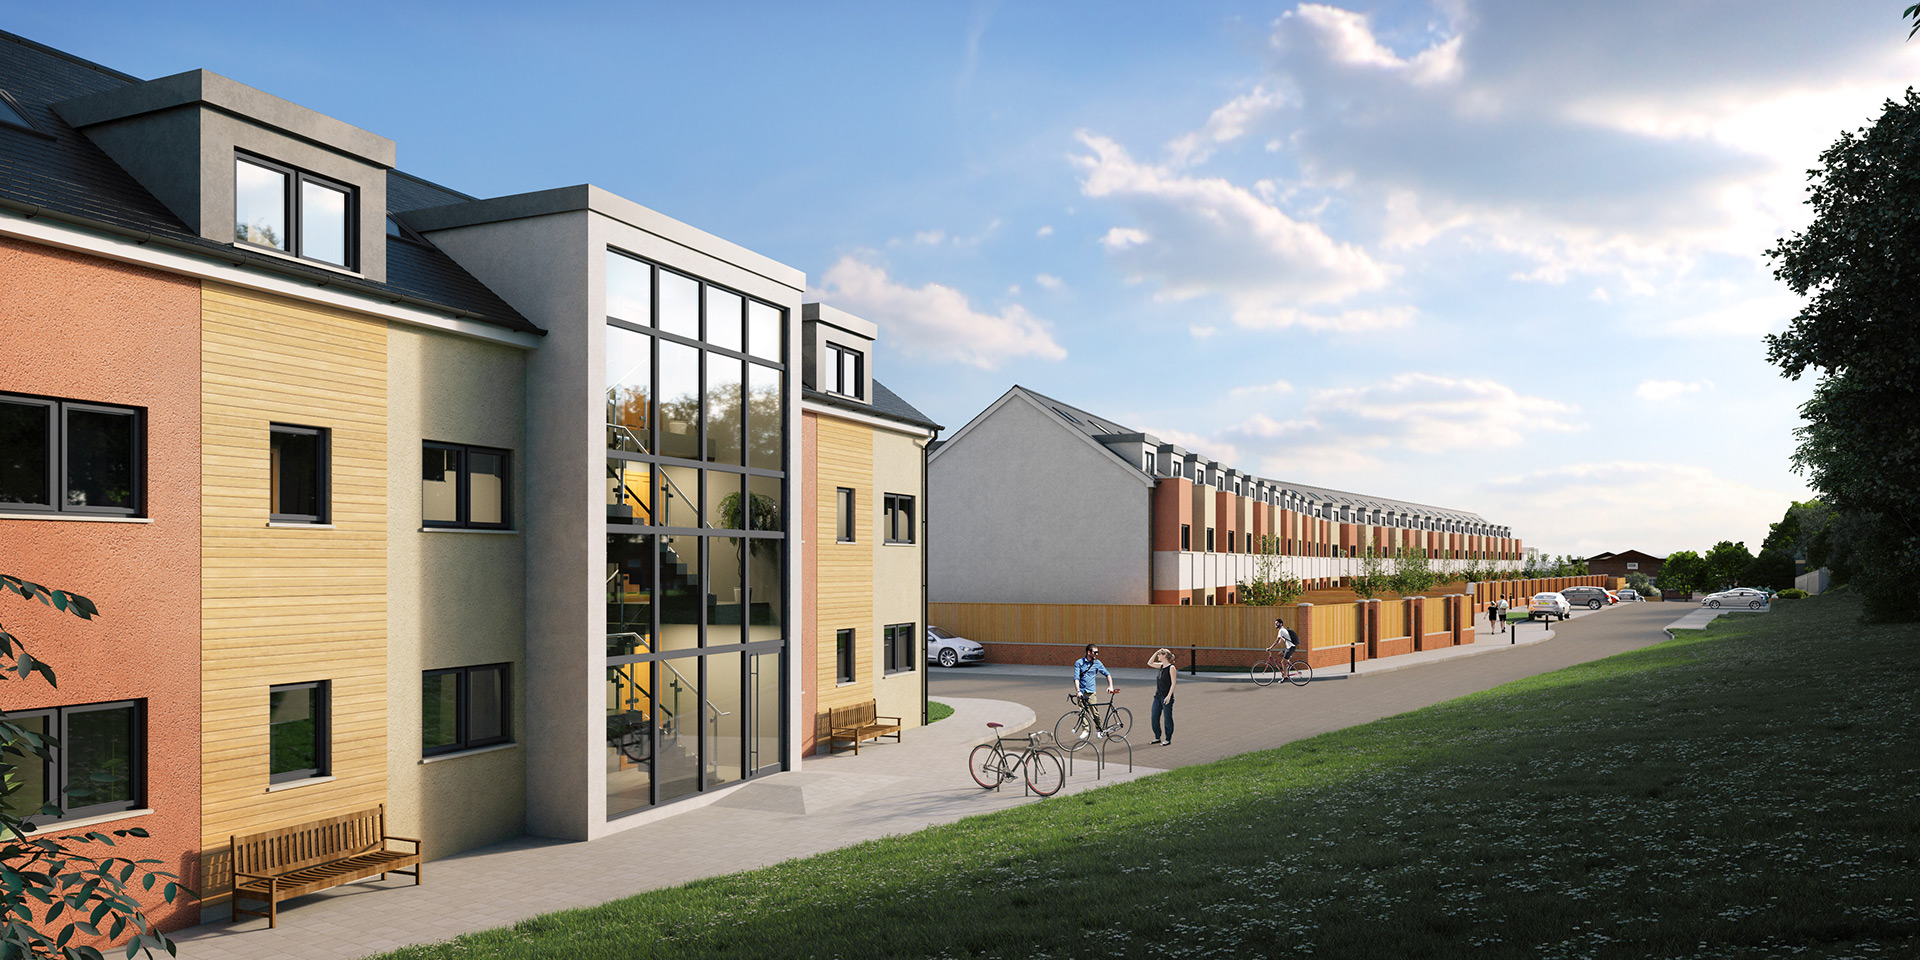 External renderings of new housing development icreate cg for New housing developments